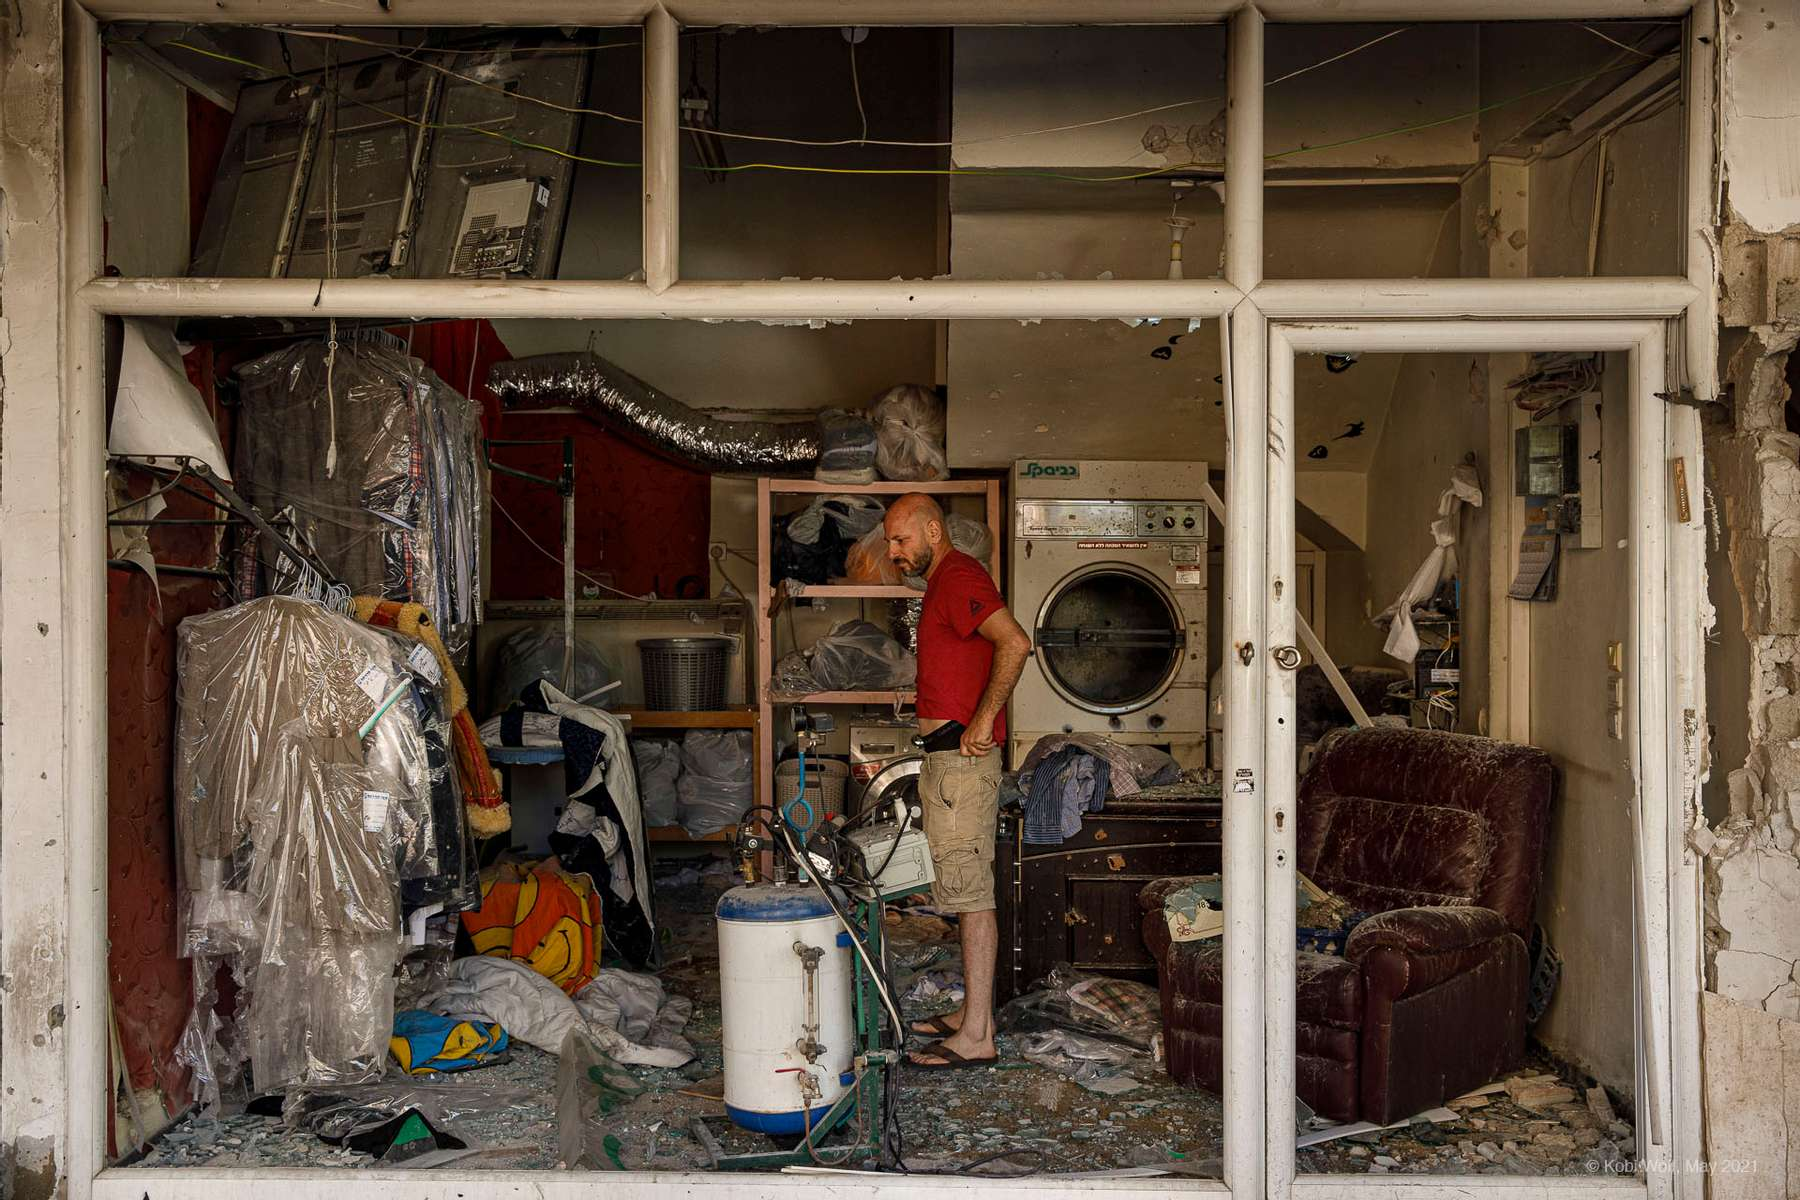 A street hit by a rocket sent from Gaza In Ramat Gan, Israel, Saturday, May 15, 2021 photographer: Kobi Wolf